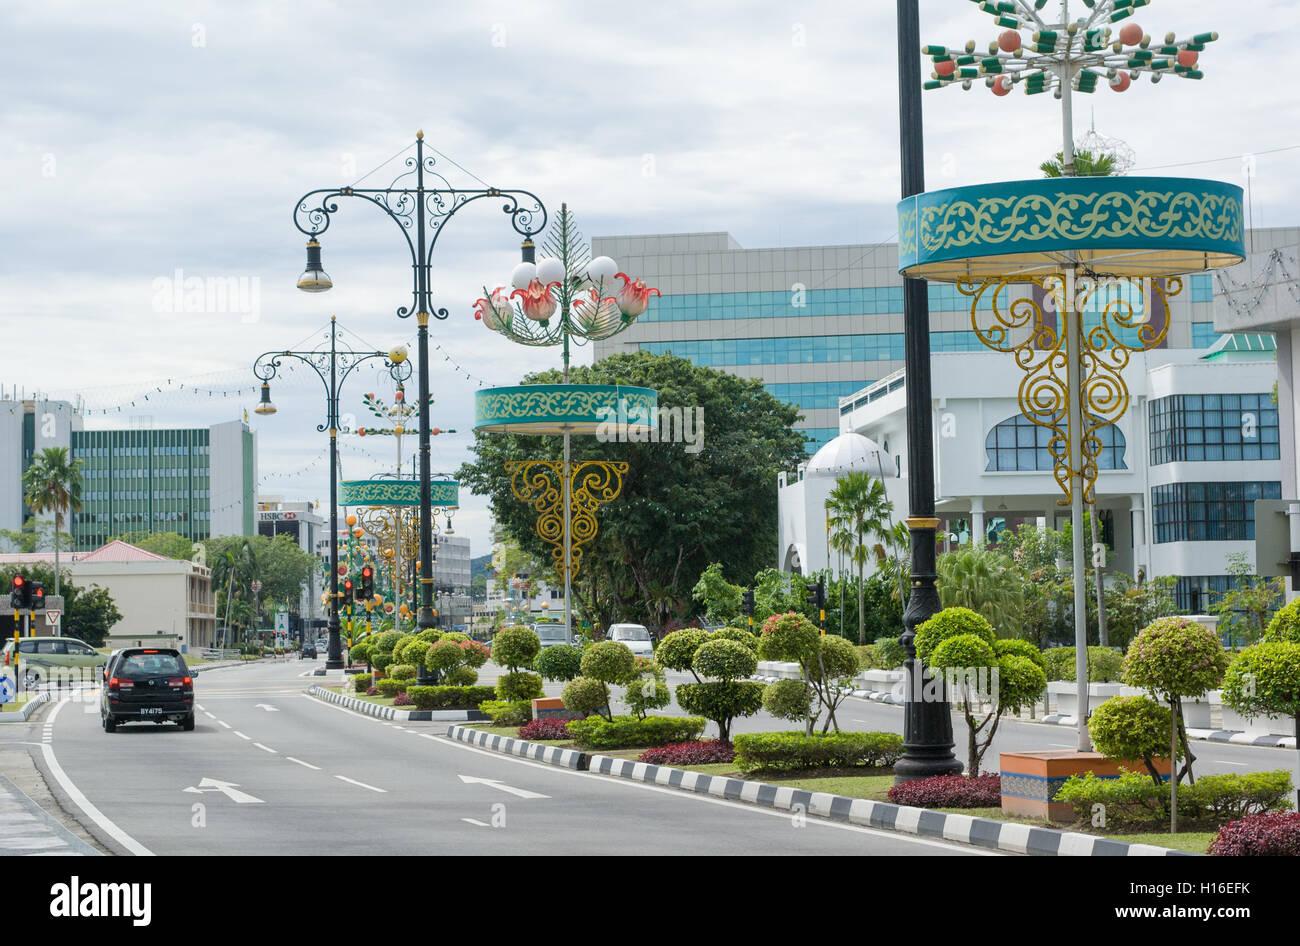 Bandar Seri Begawan with beautiful street lamps and topiary gardens - Stock Image